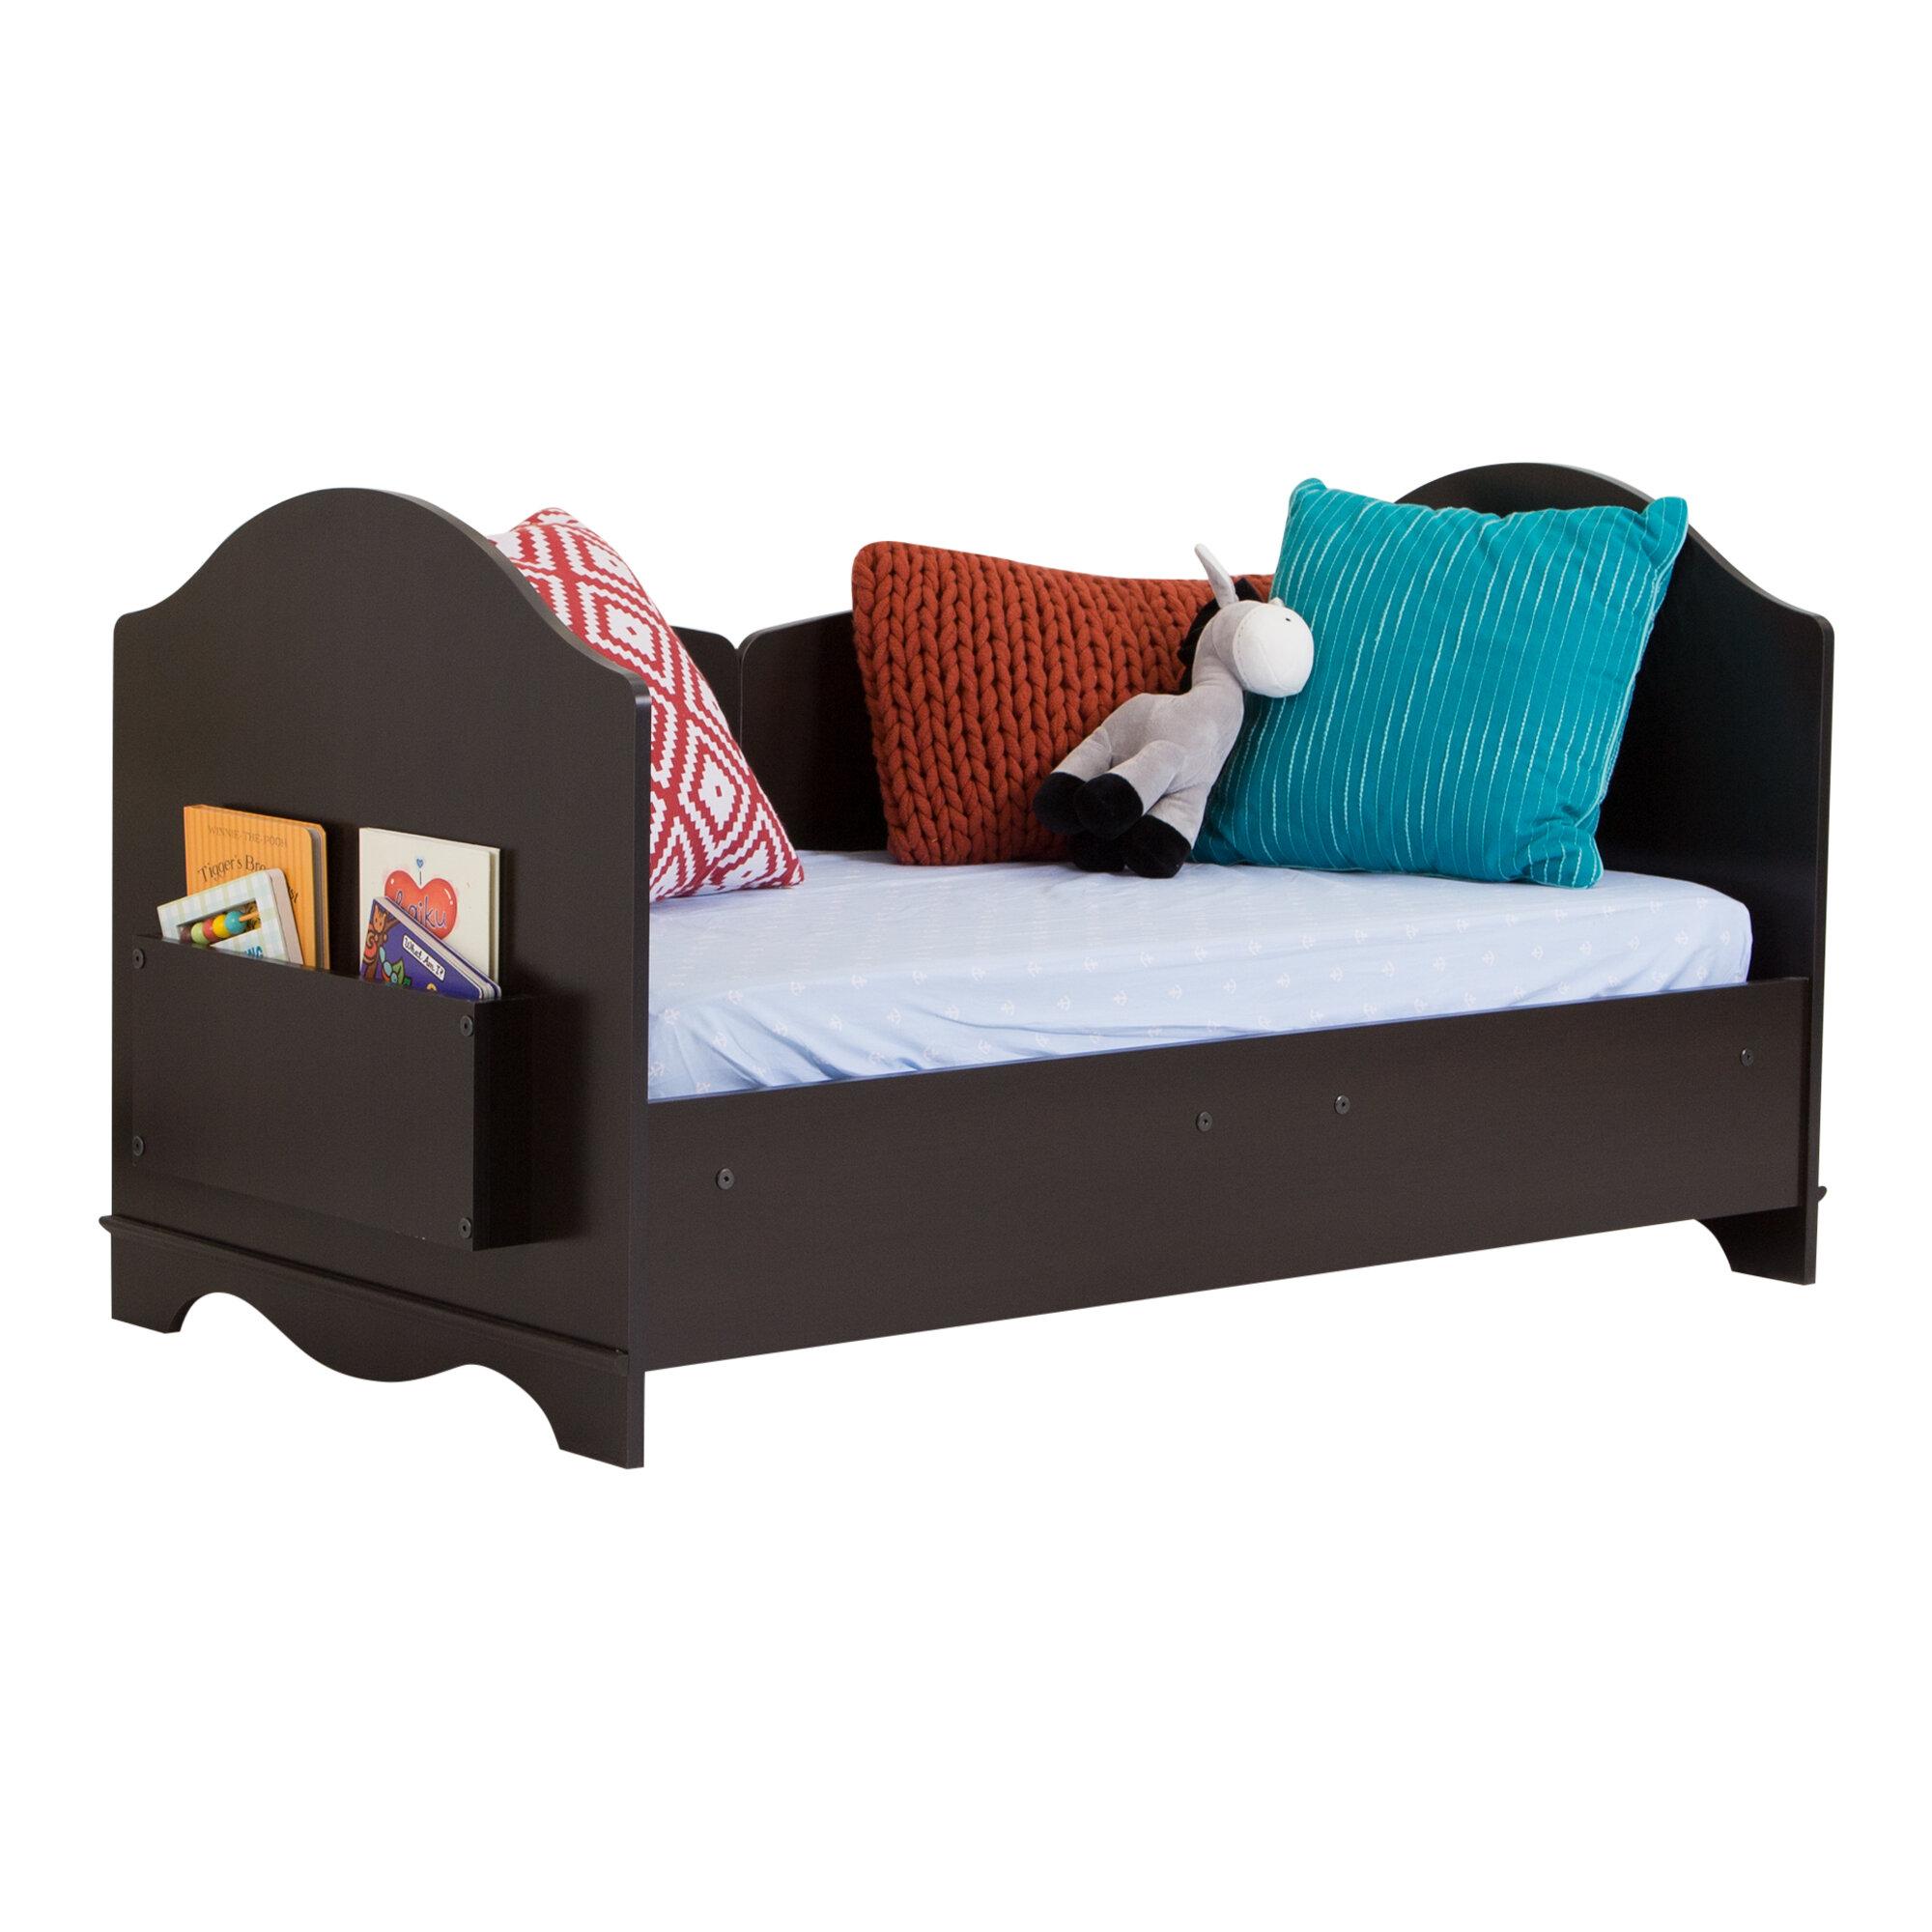 South Shore Savannah Convertible Toddler Bed U0026 Reviews   Wayfair